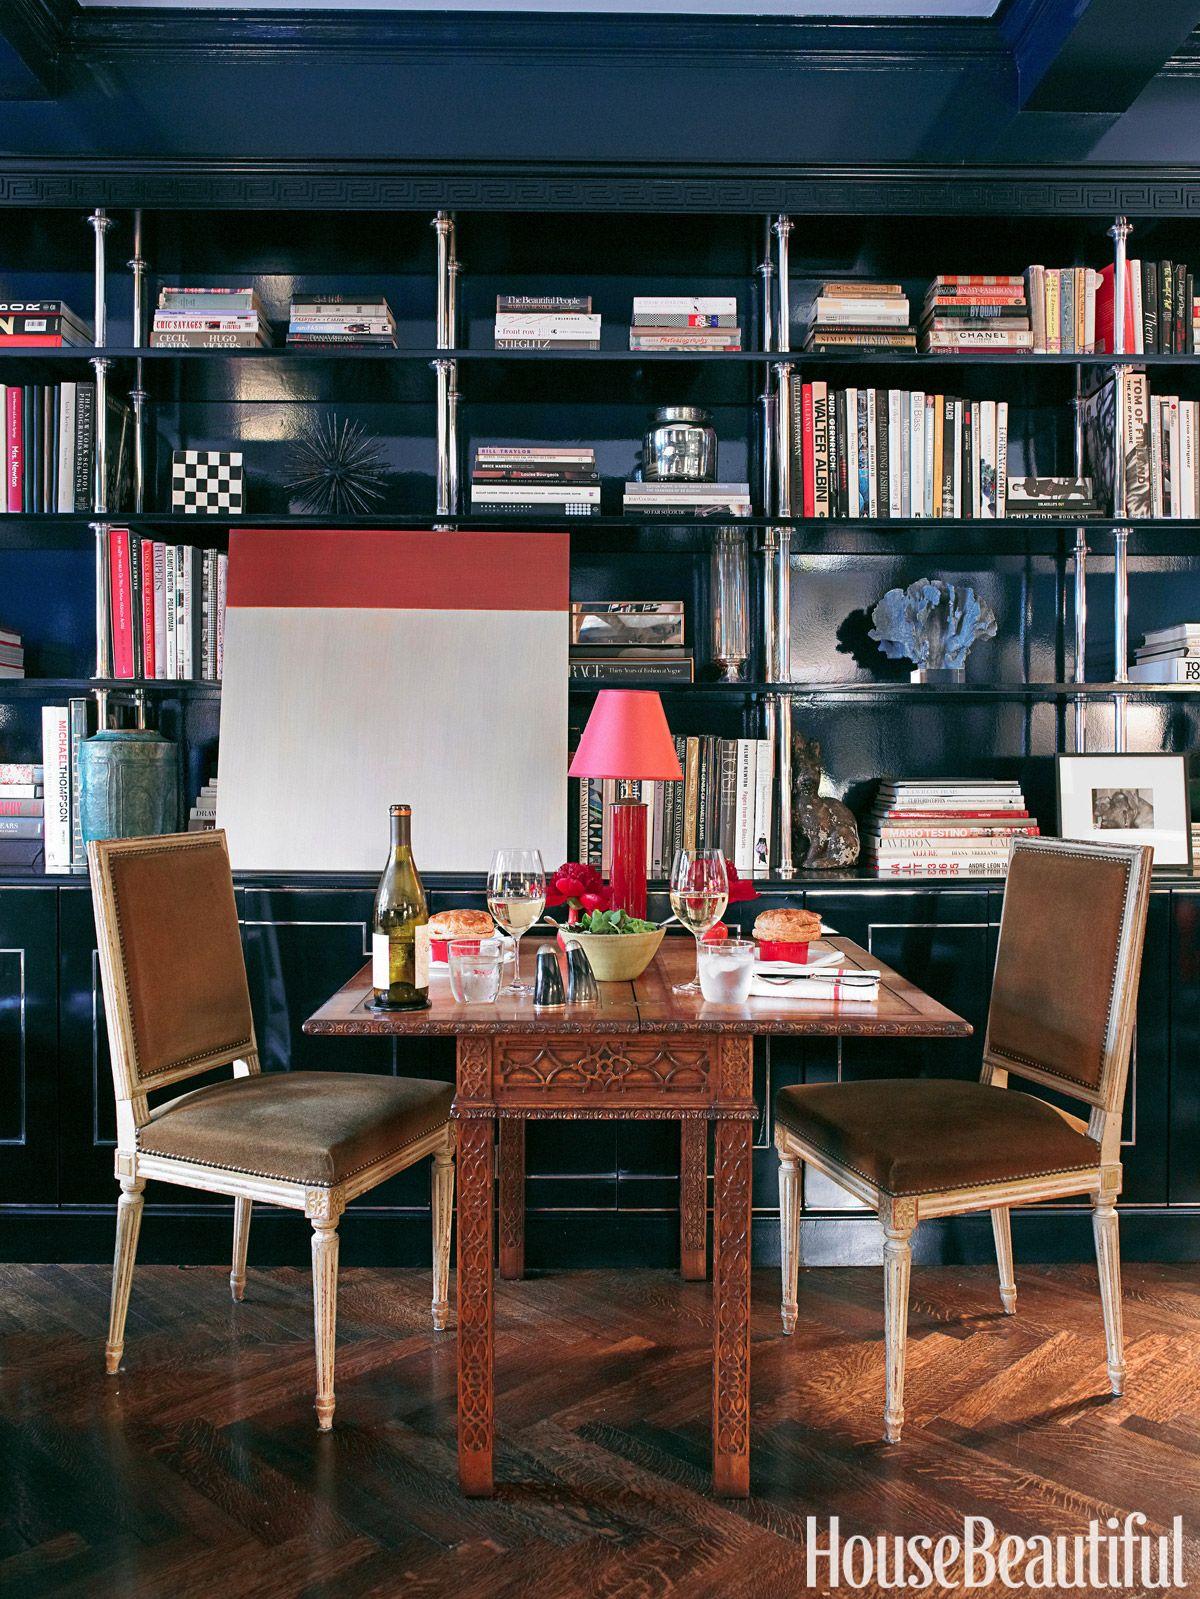 Classic Home Library Design: 45 Classic Library Design Ideas